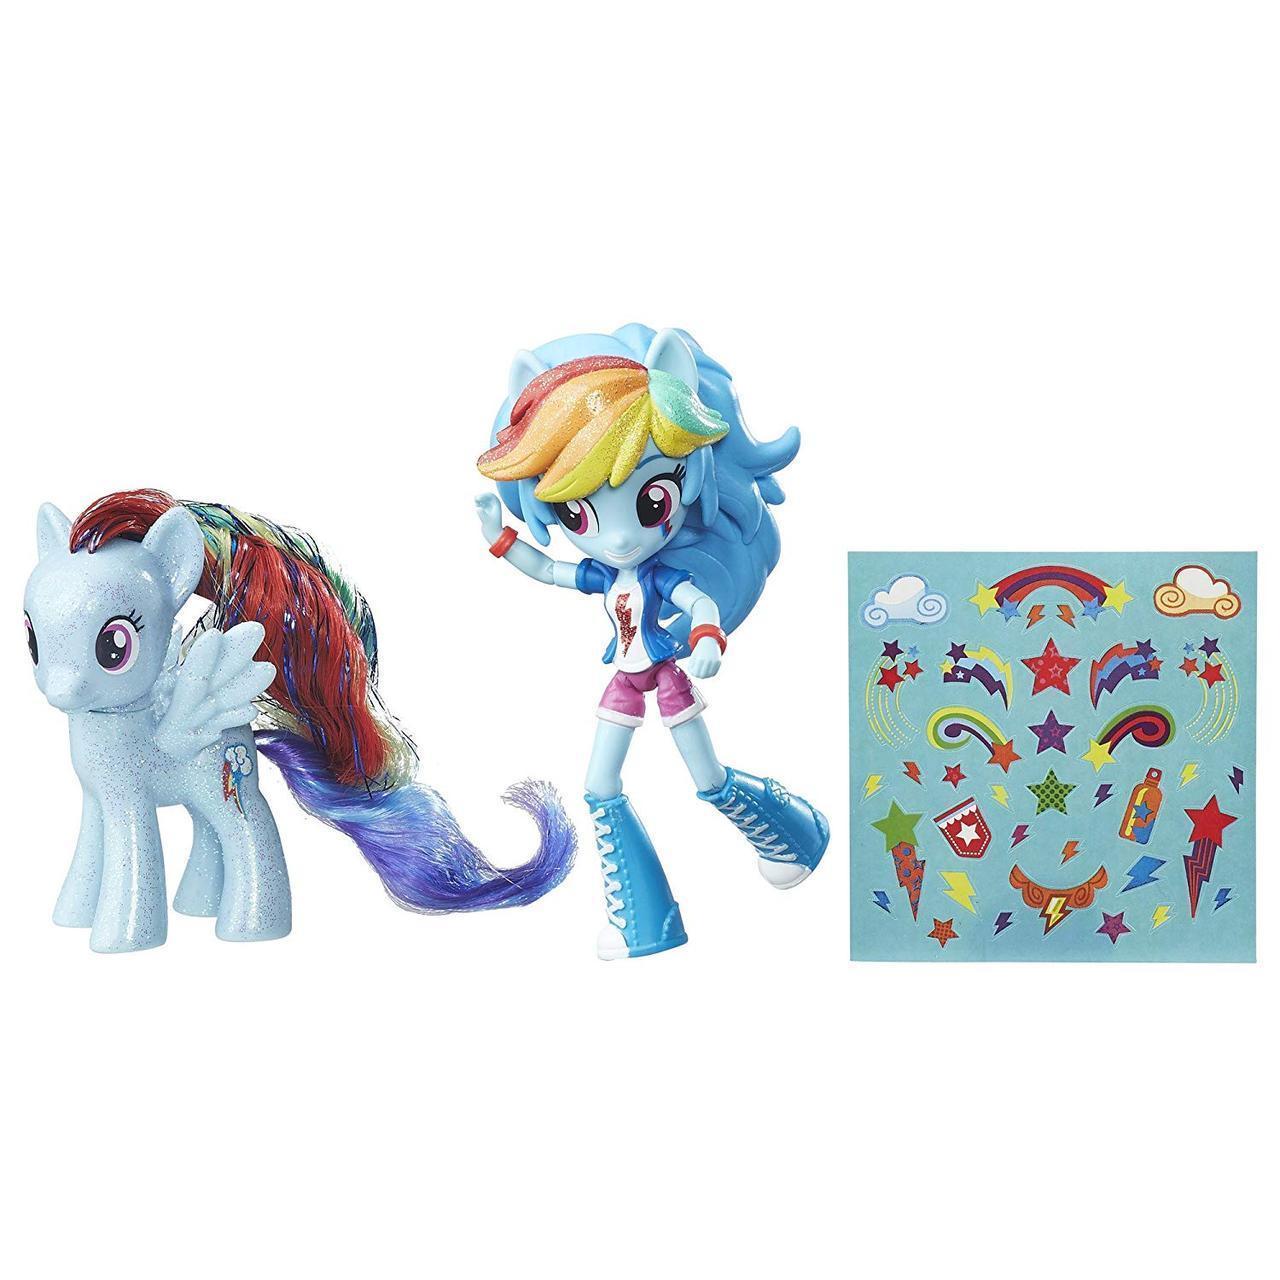 Набір Травень лител поні Мосту Деши блискуча поні My Little Pony Rainbow Dash & Glitter Pony Element Friendship